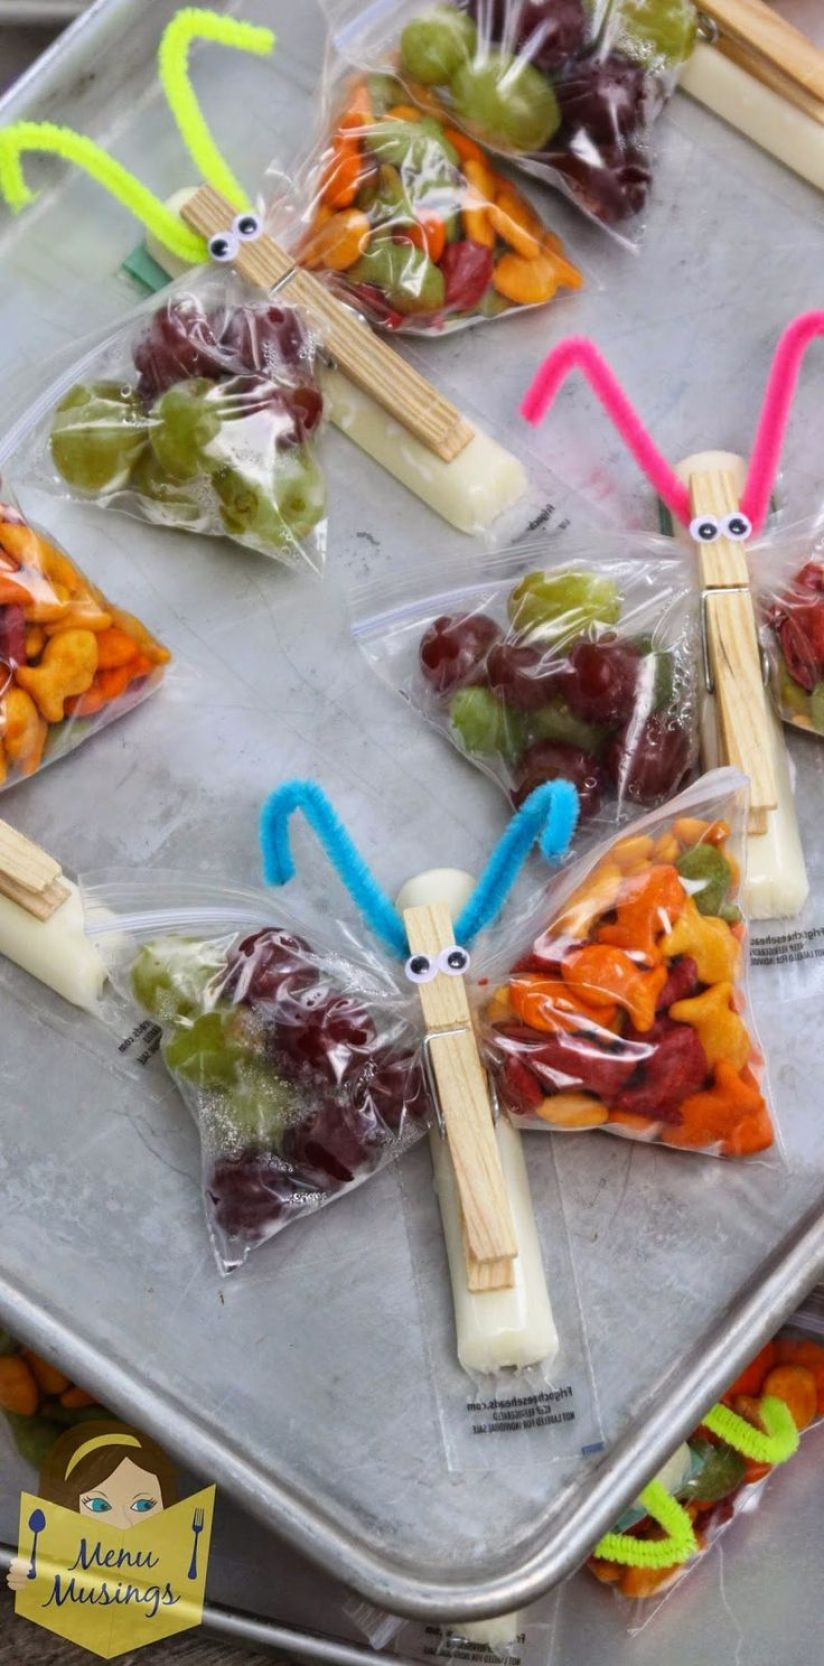 Healthy Kid Snacks To Buy  25 Fun and Healthy Snacks for Kids Uplifting Mayhem